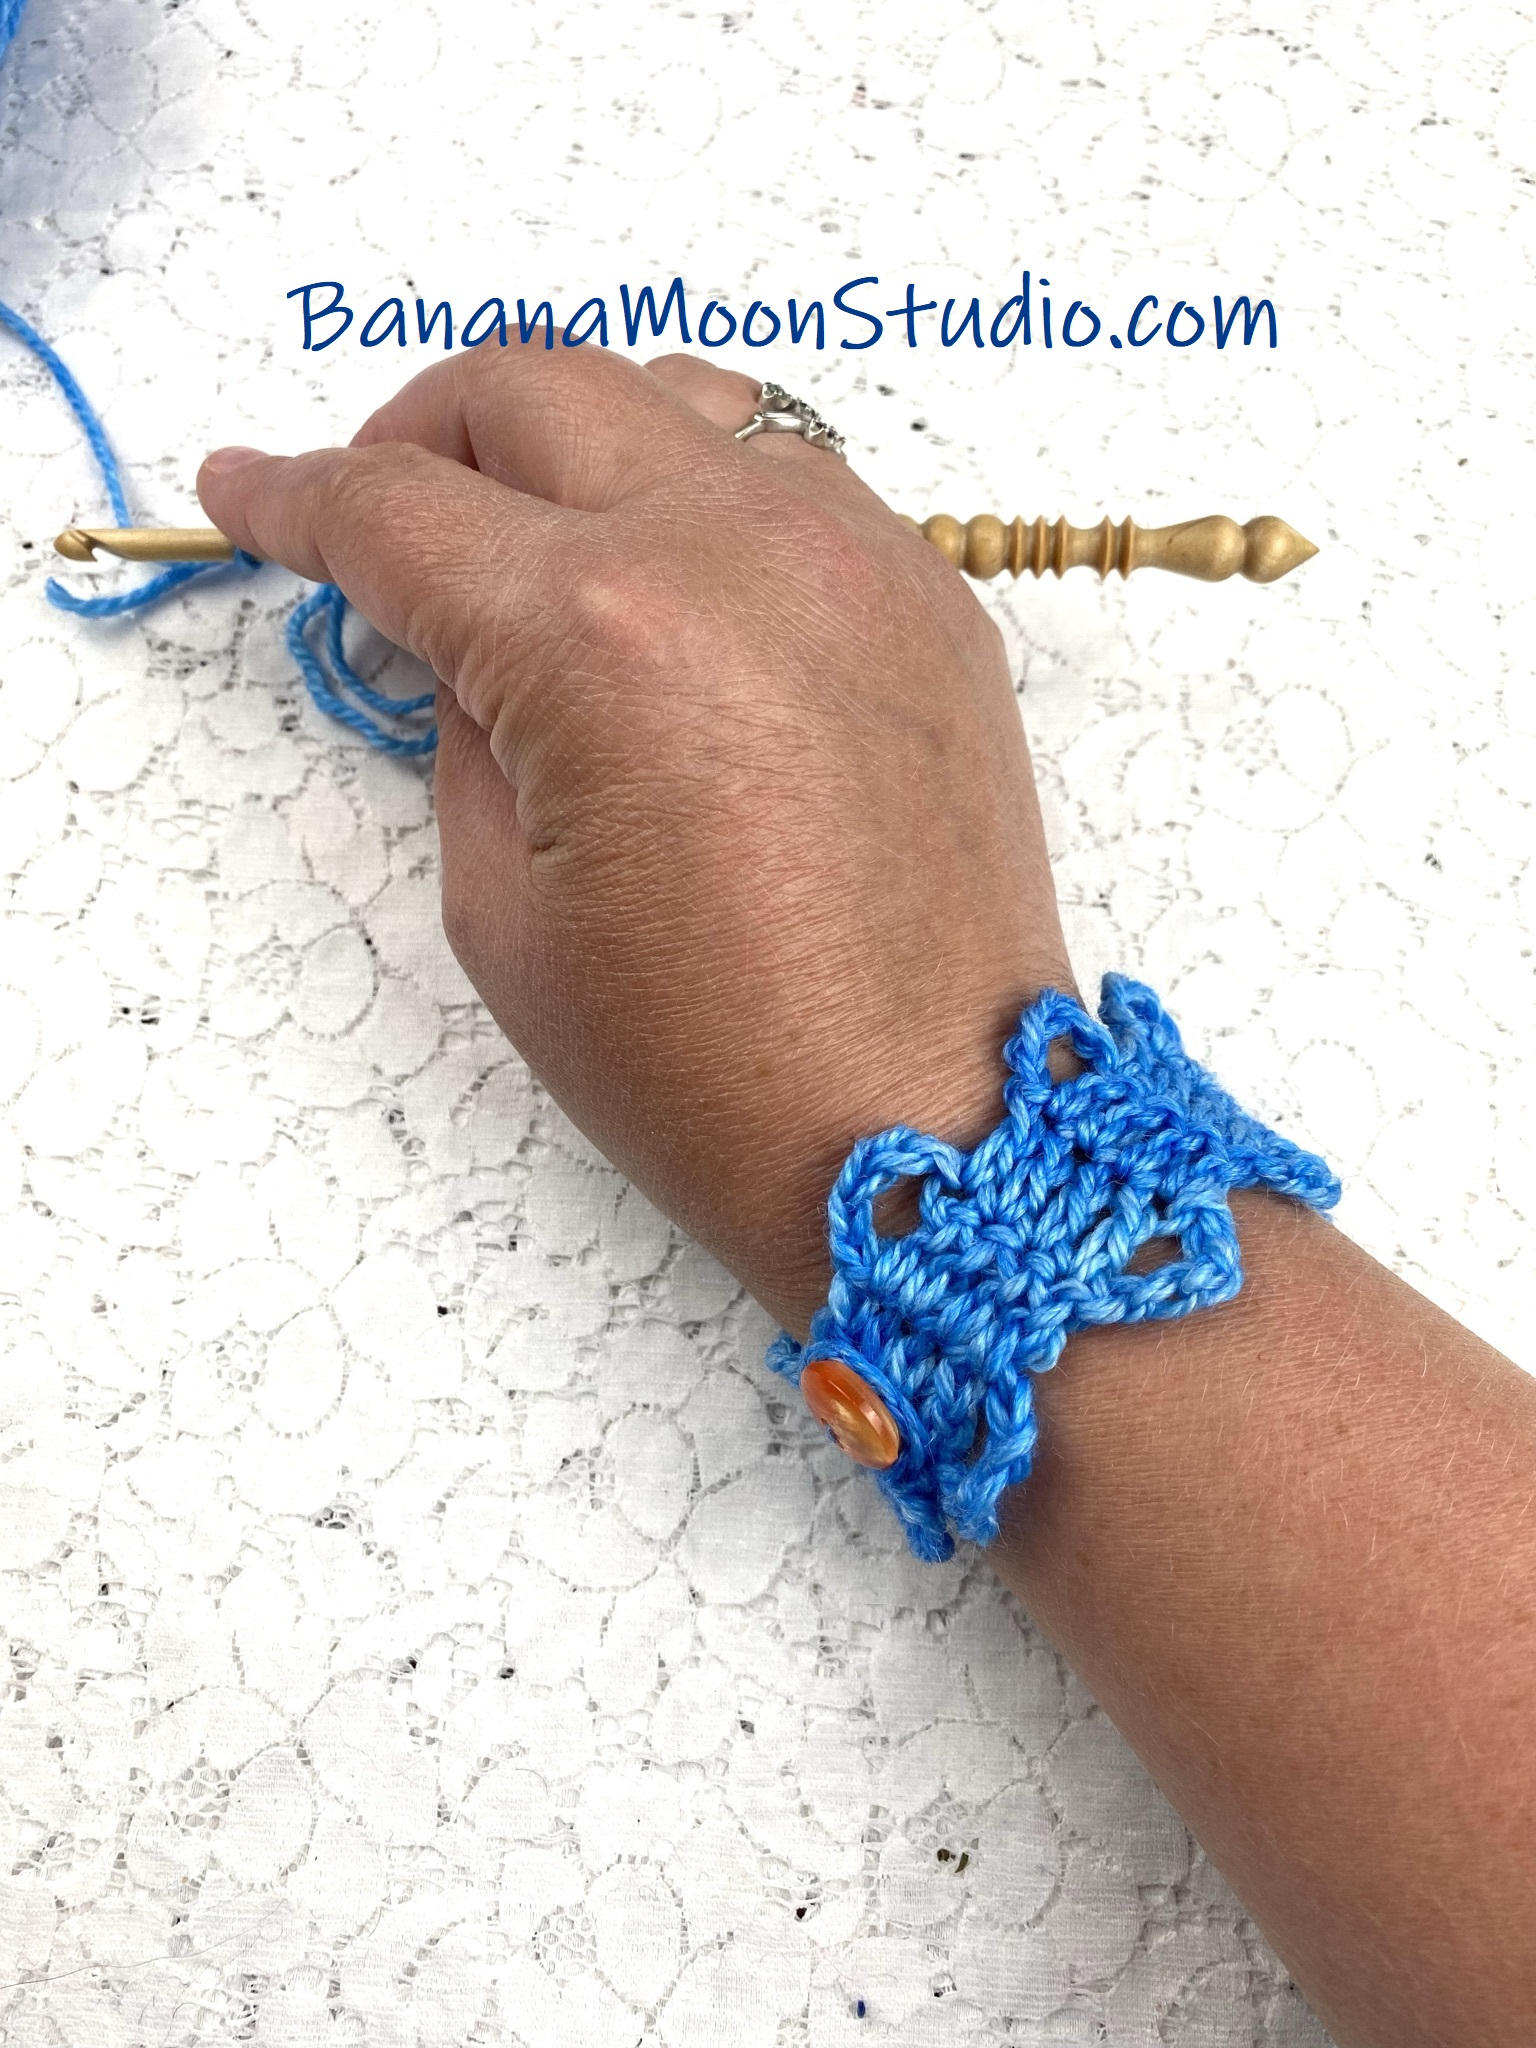 Hand holding a crochet hook with a blue crochet bracelet on wrist.